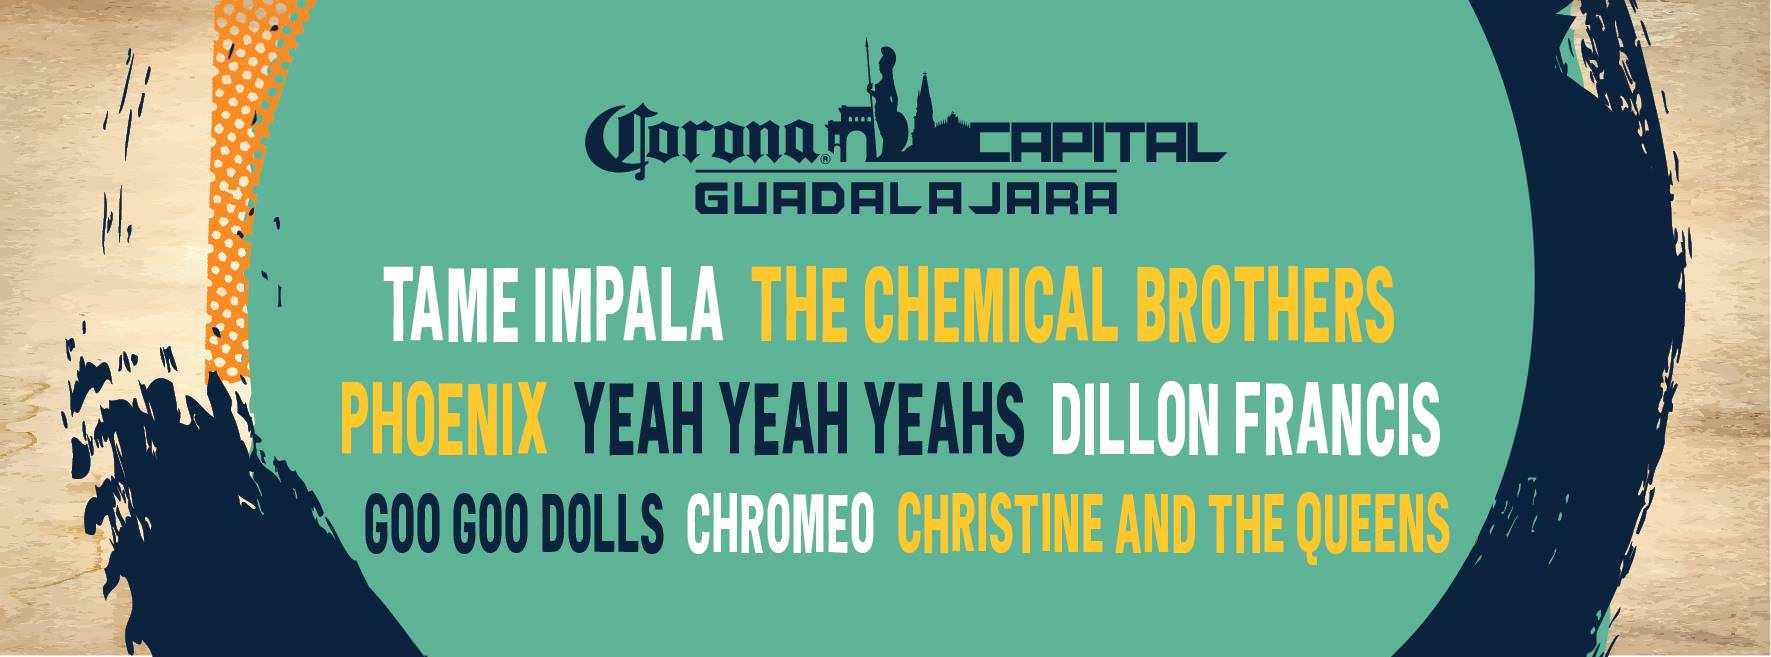 Lineup Corona Capital GDL 2019